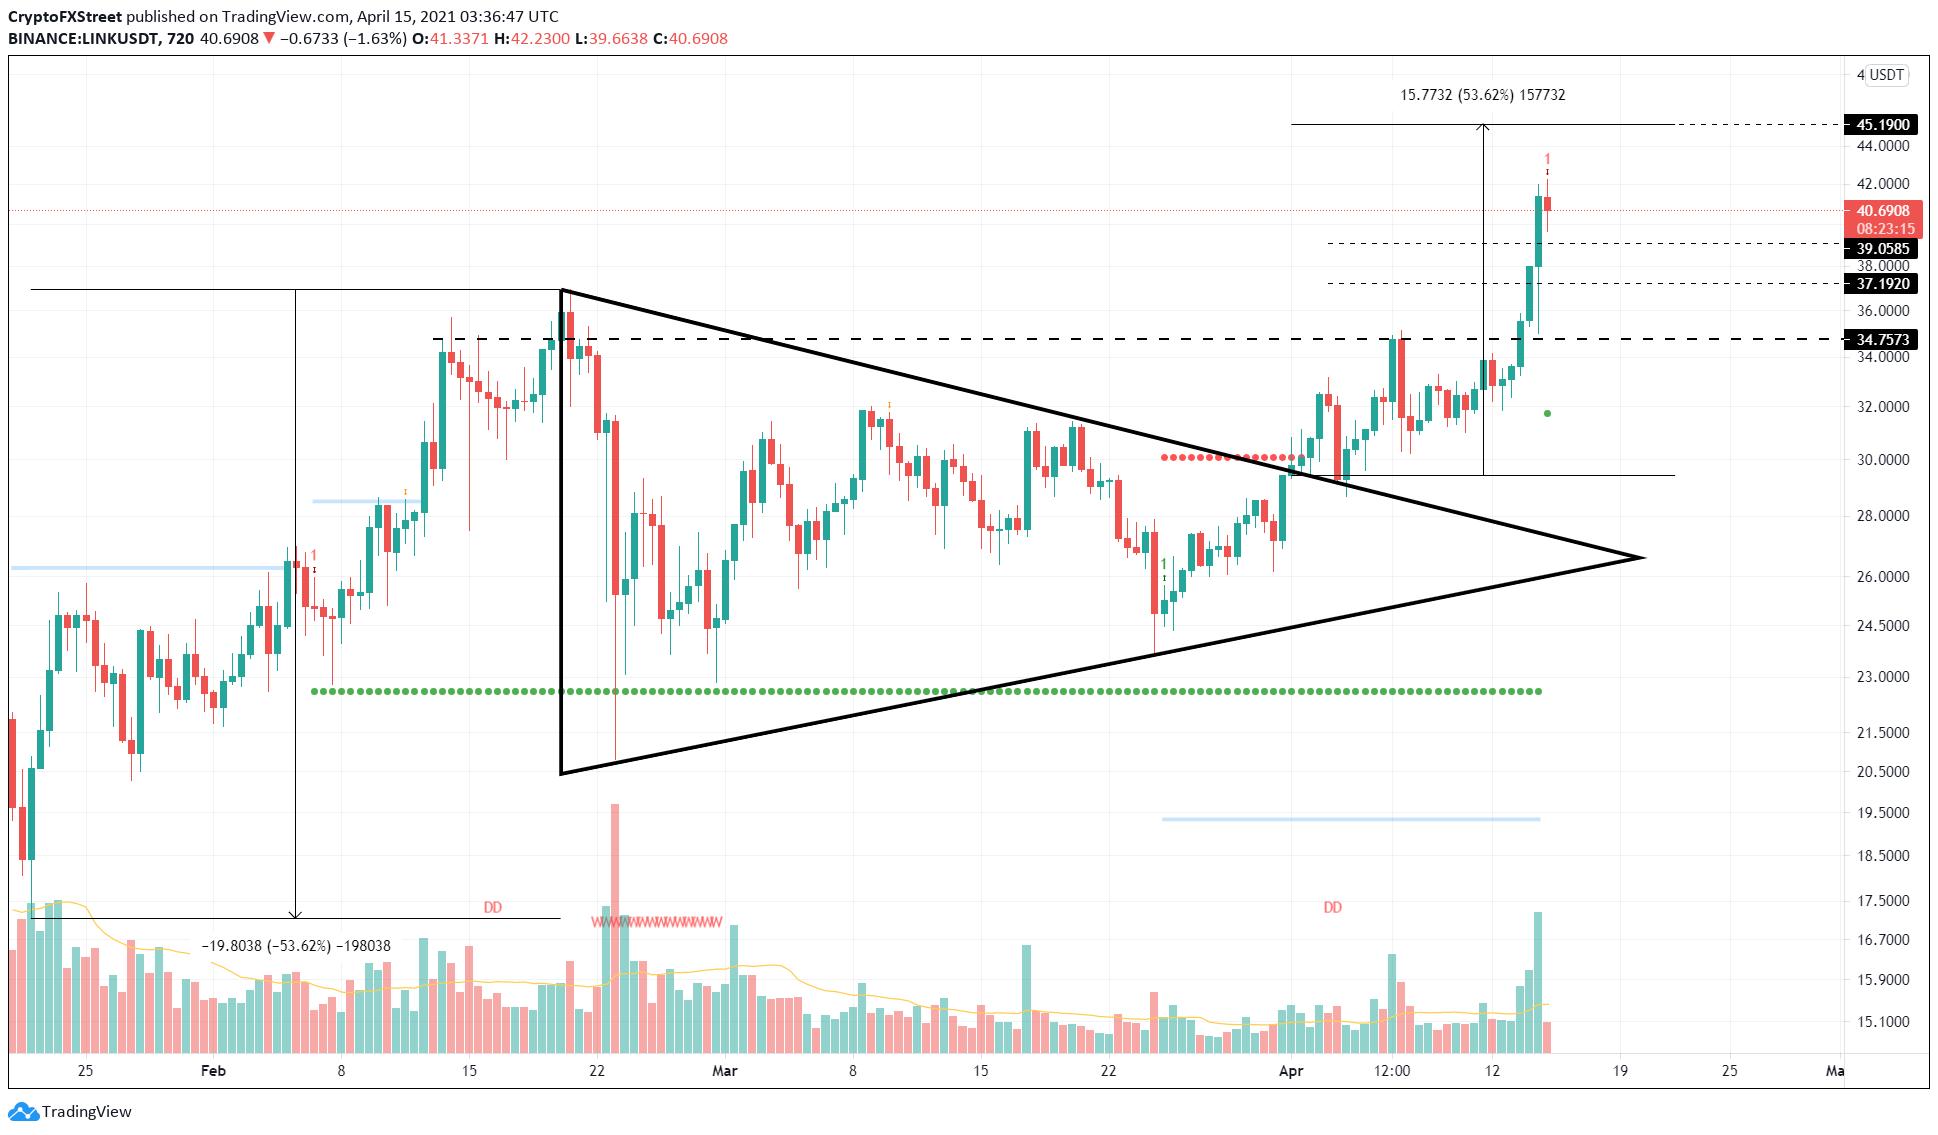 LINK/USDT 12-hour chart